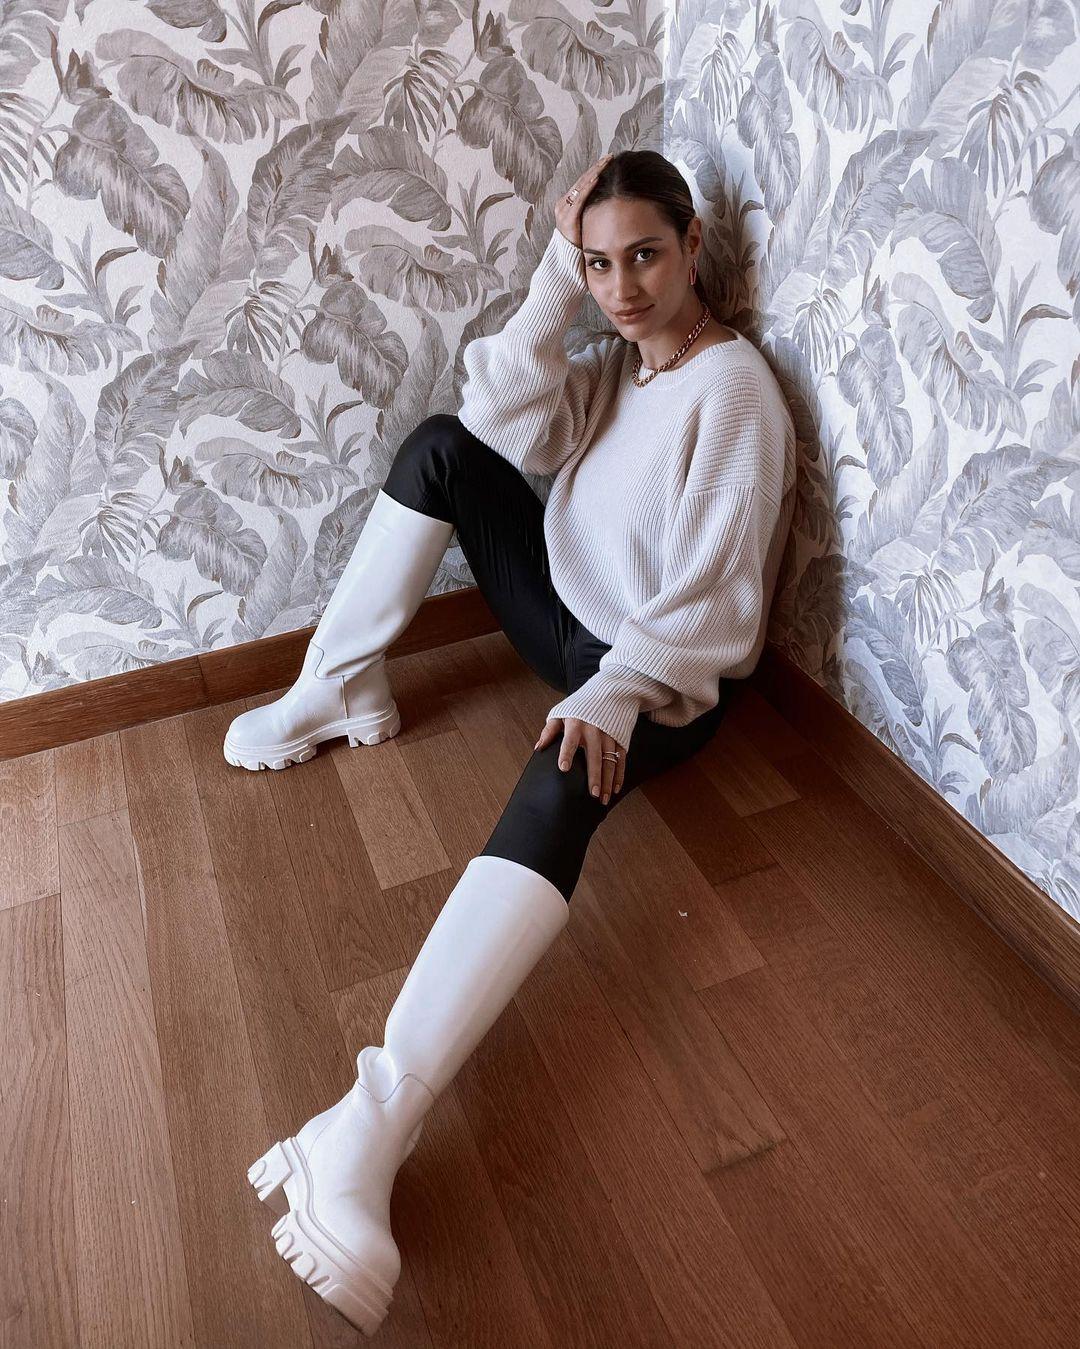 Beatrice-Valli-Wallpapers-Insta-Fit-Bio-4